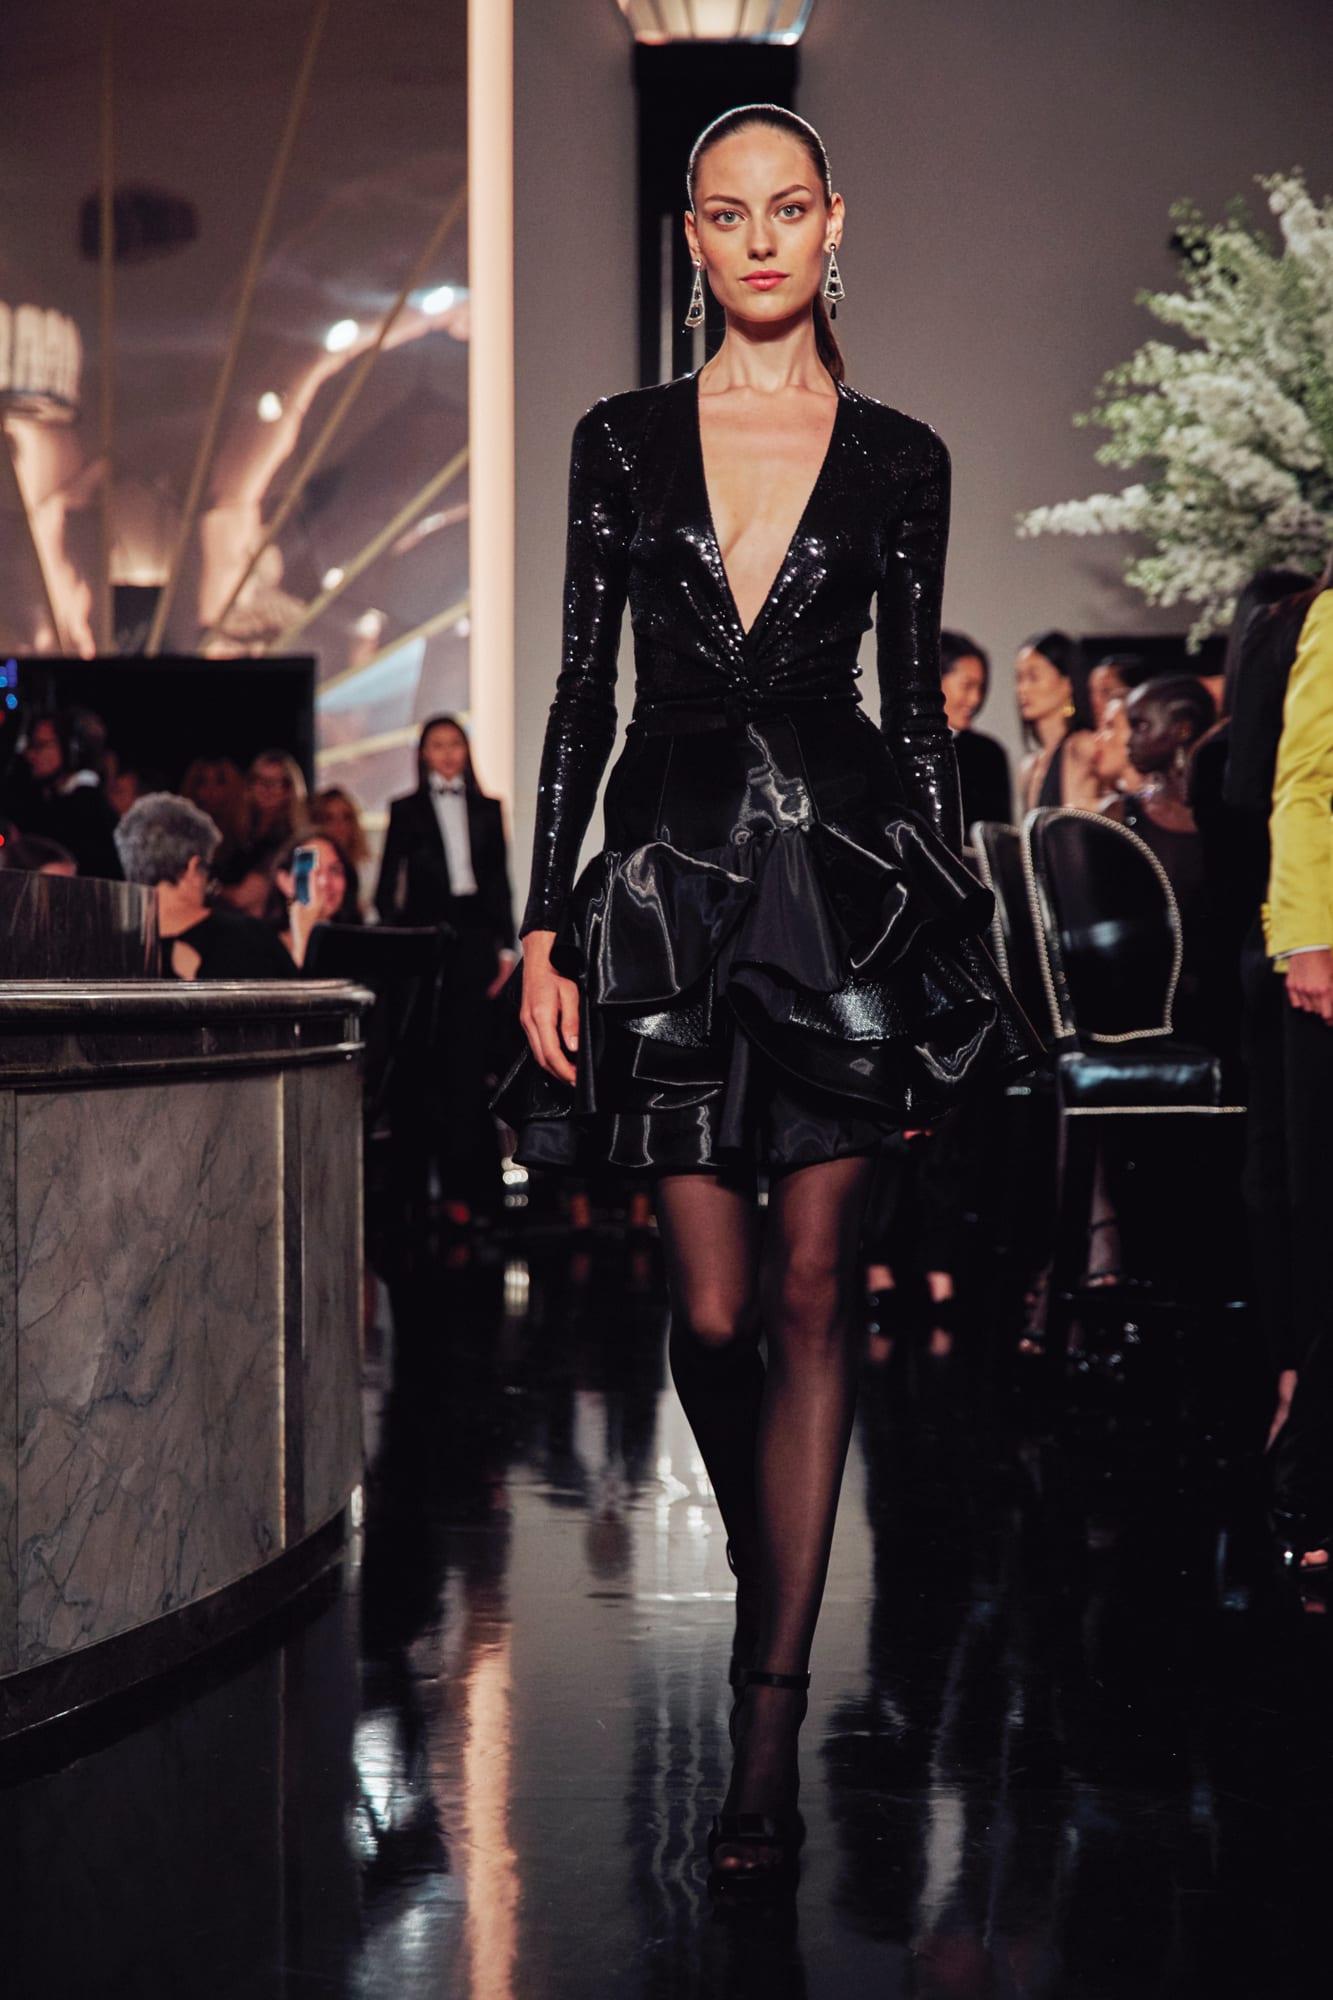 đầm cocktail hở màu đen ralph lauren thu đông 2019